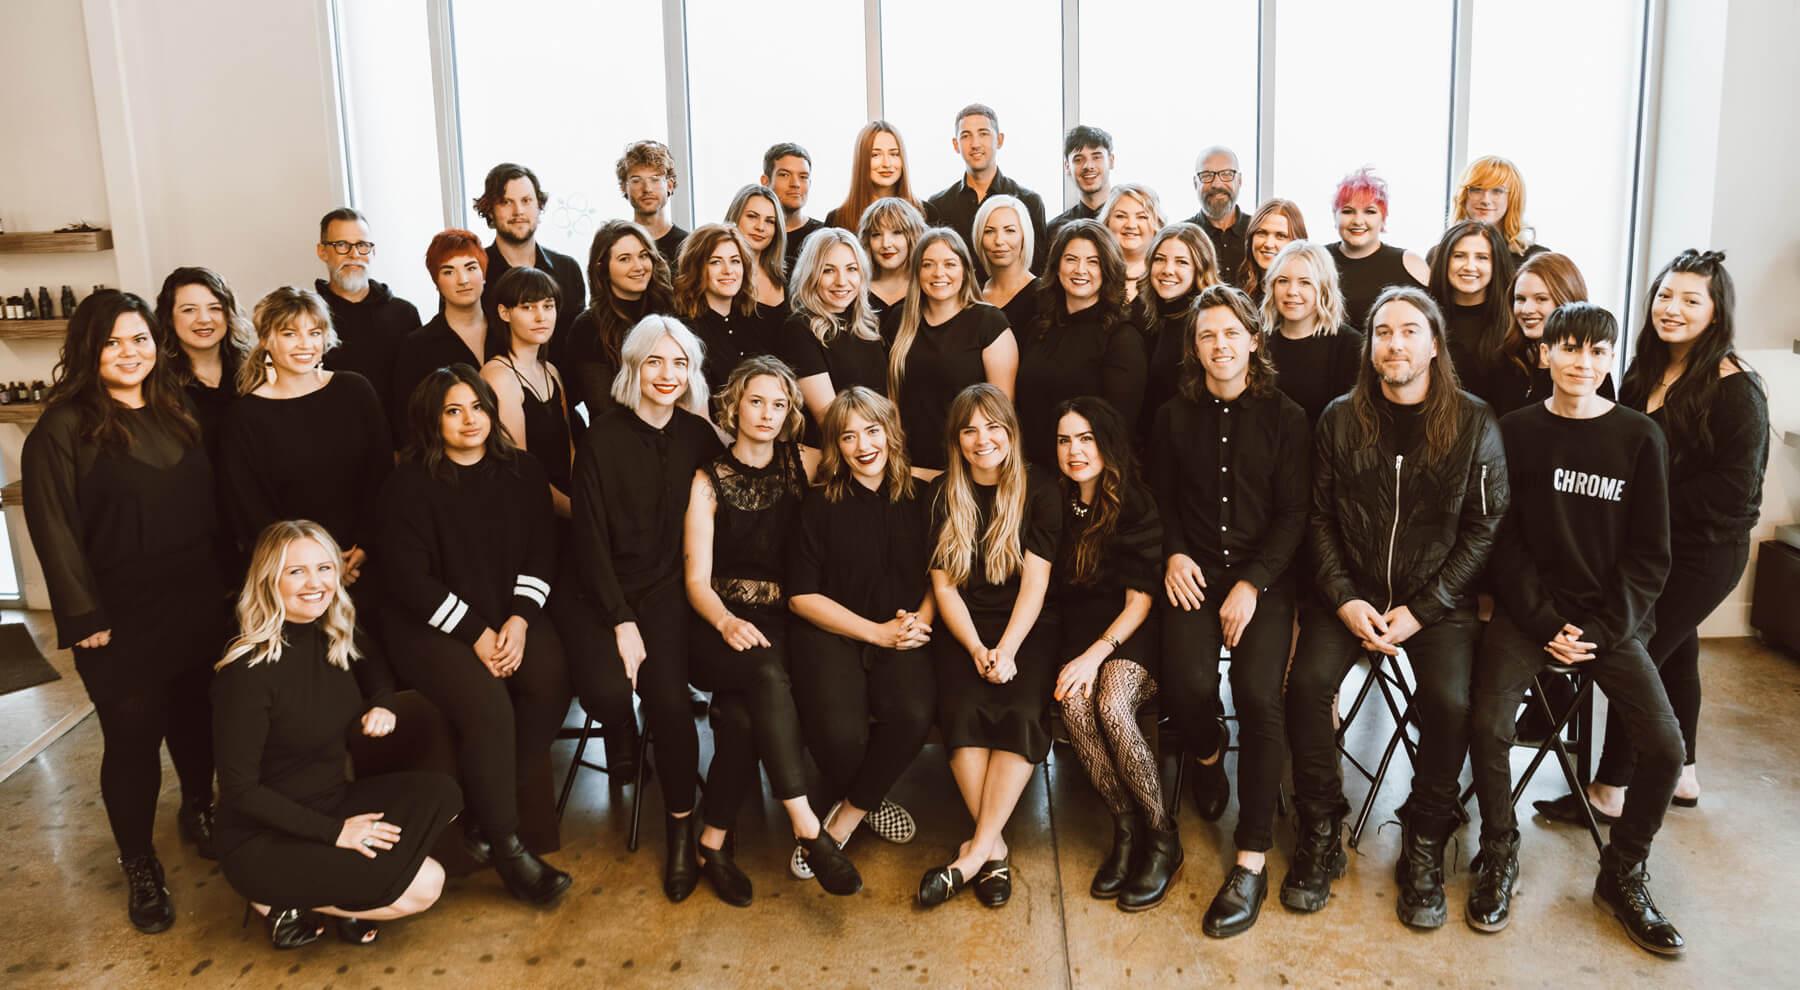 Utah's Top Rated Local® Beauty Salons & Spas Award Winner: Landis Lifestyle Salon